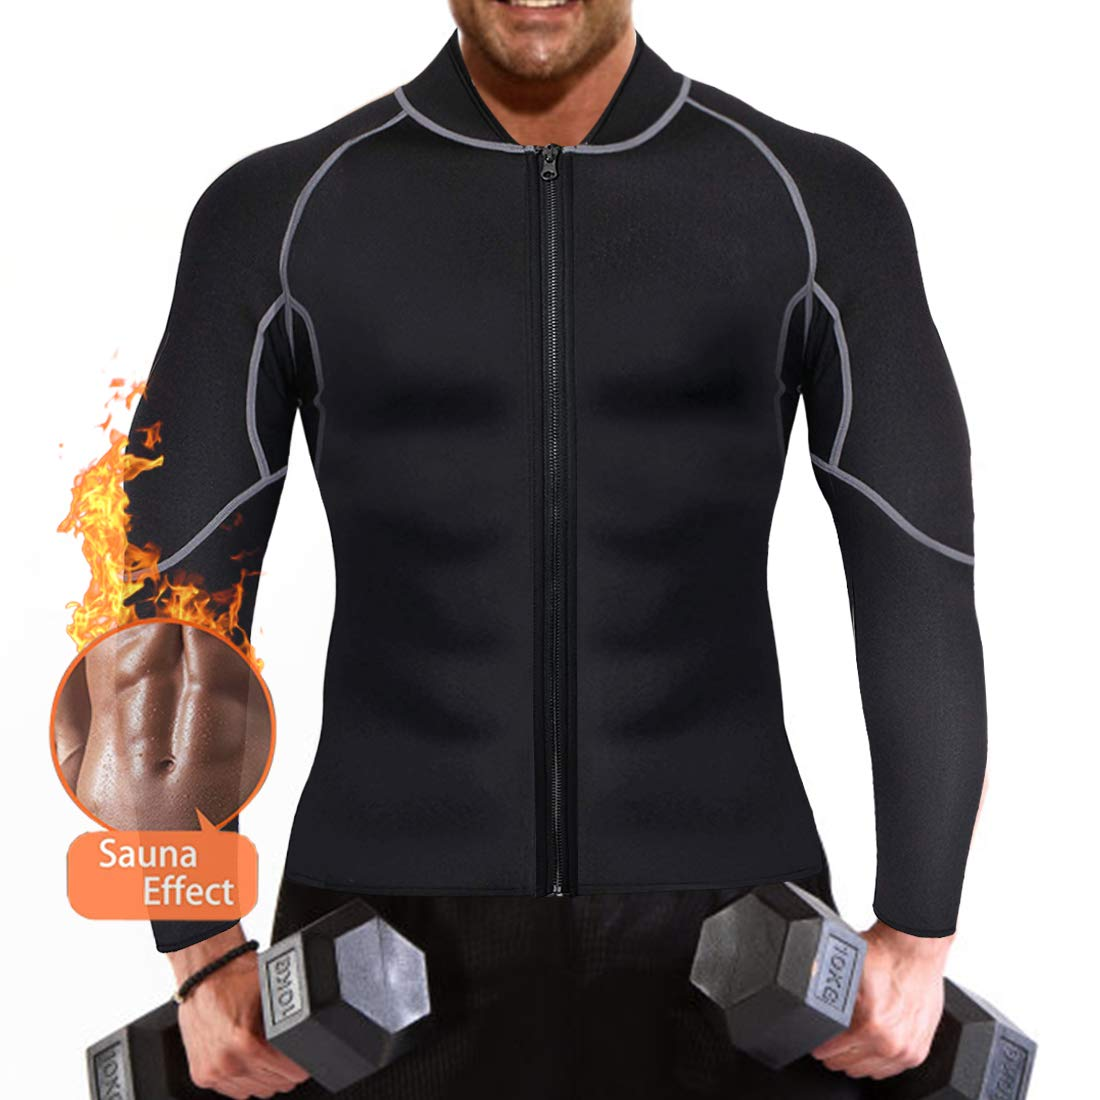 QUAFORT ネオプレン製 減量サウナスーツ メンズ スリミングウエスト トレーニング ボディシェイパー トレーニングシャツ ジャケット ジムトップウェア 長袖 XXX-Large ブラック B07KP26QTQ